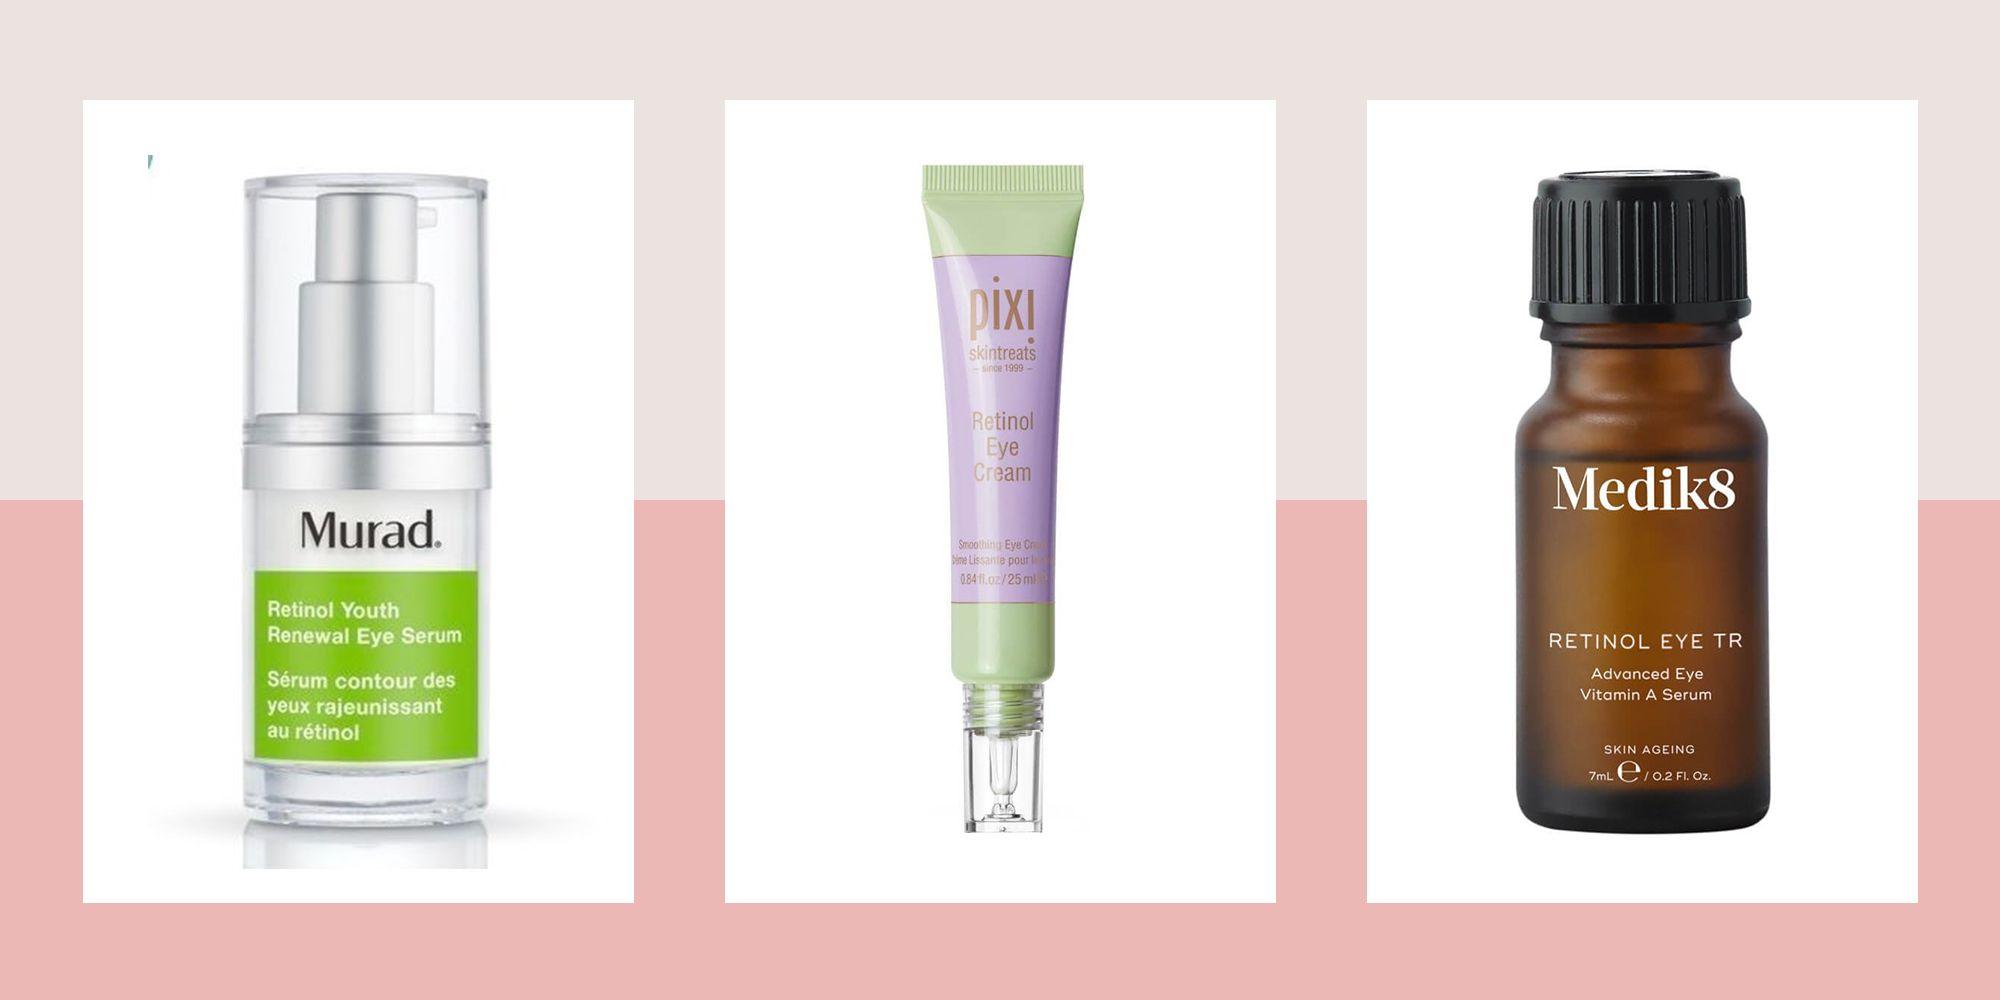 Retinol Eye Cream Products Our Beauty Team Love